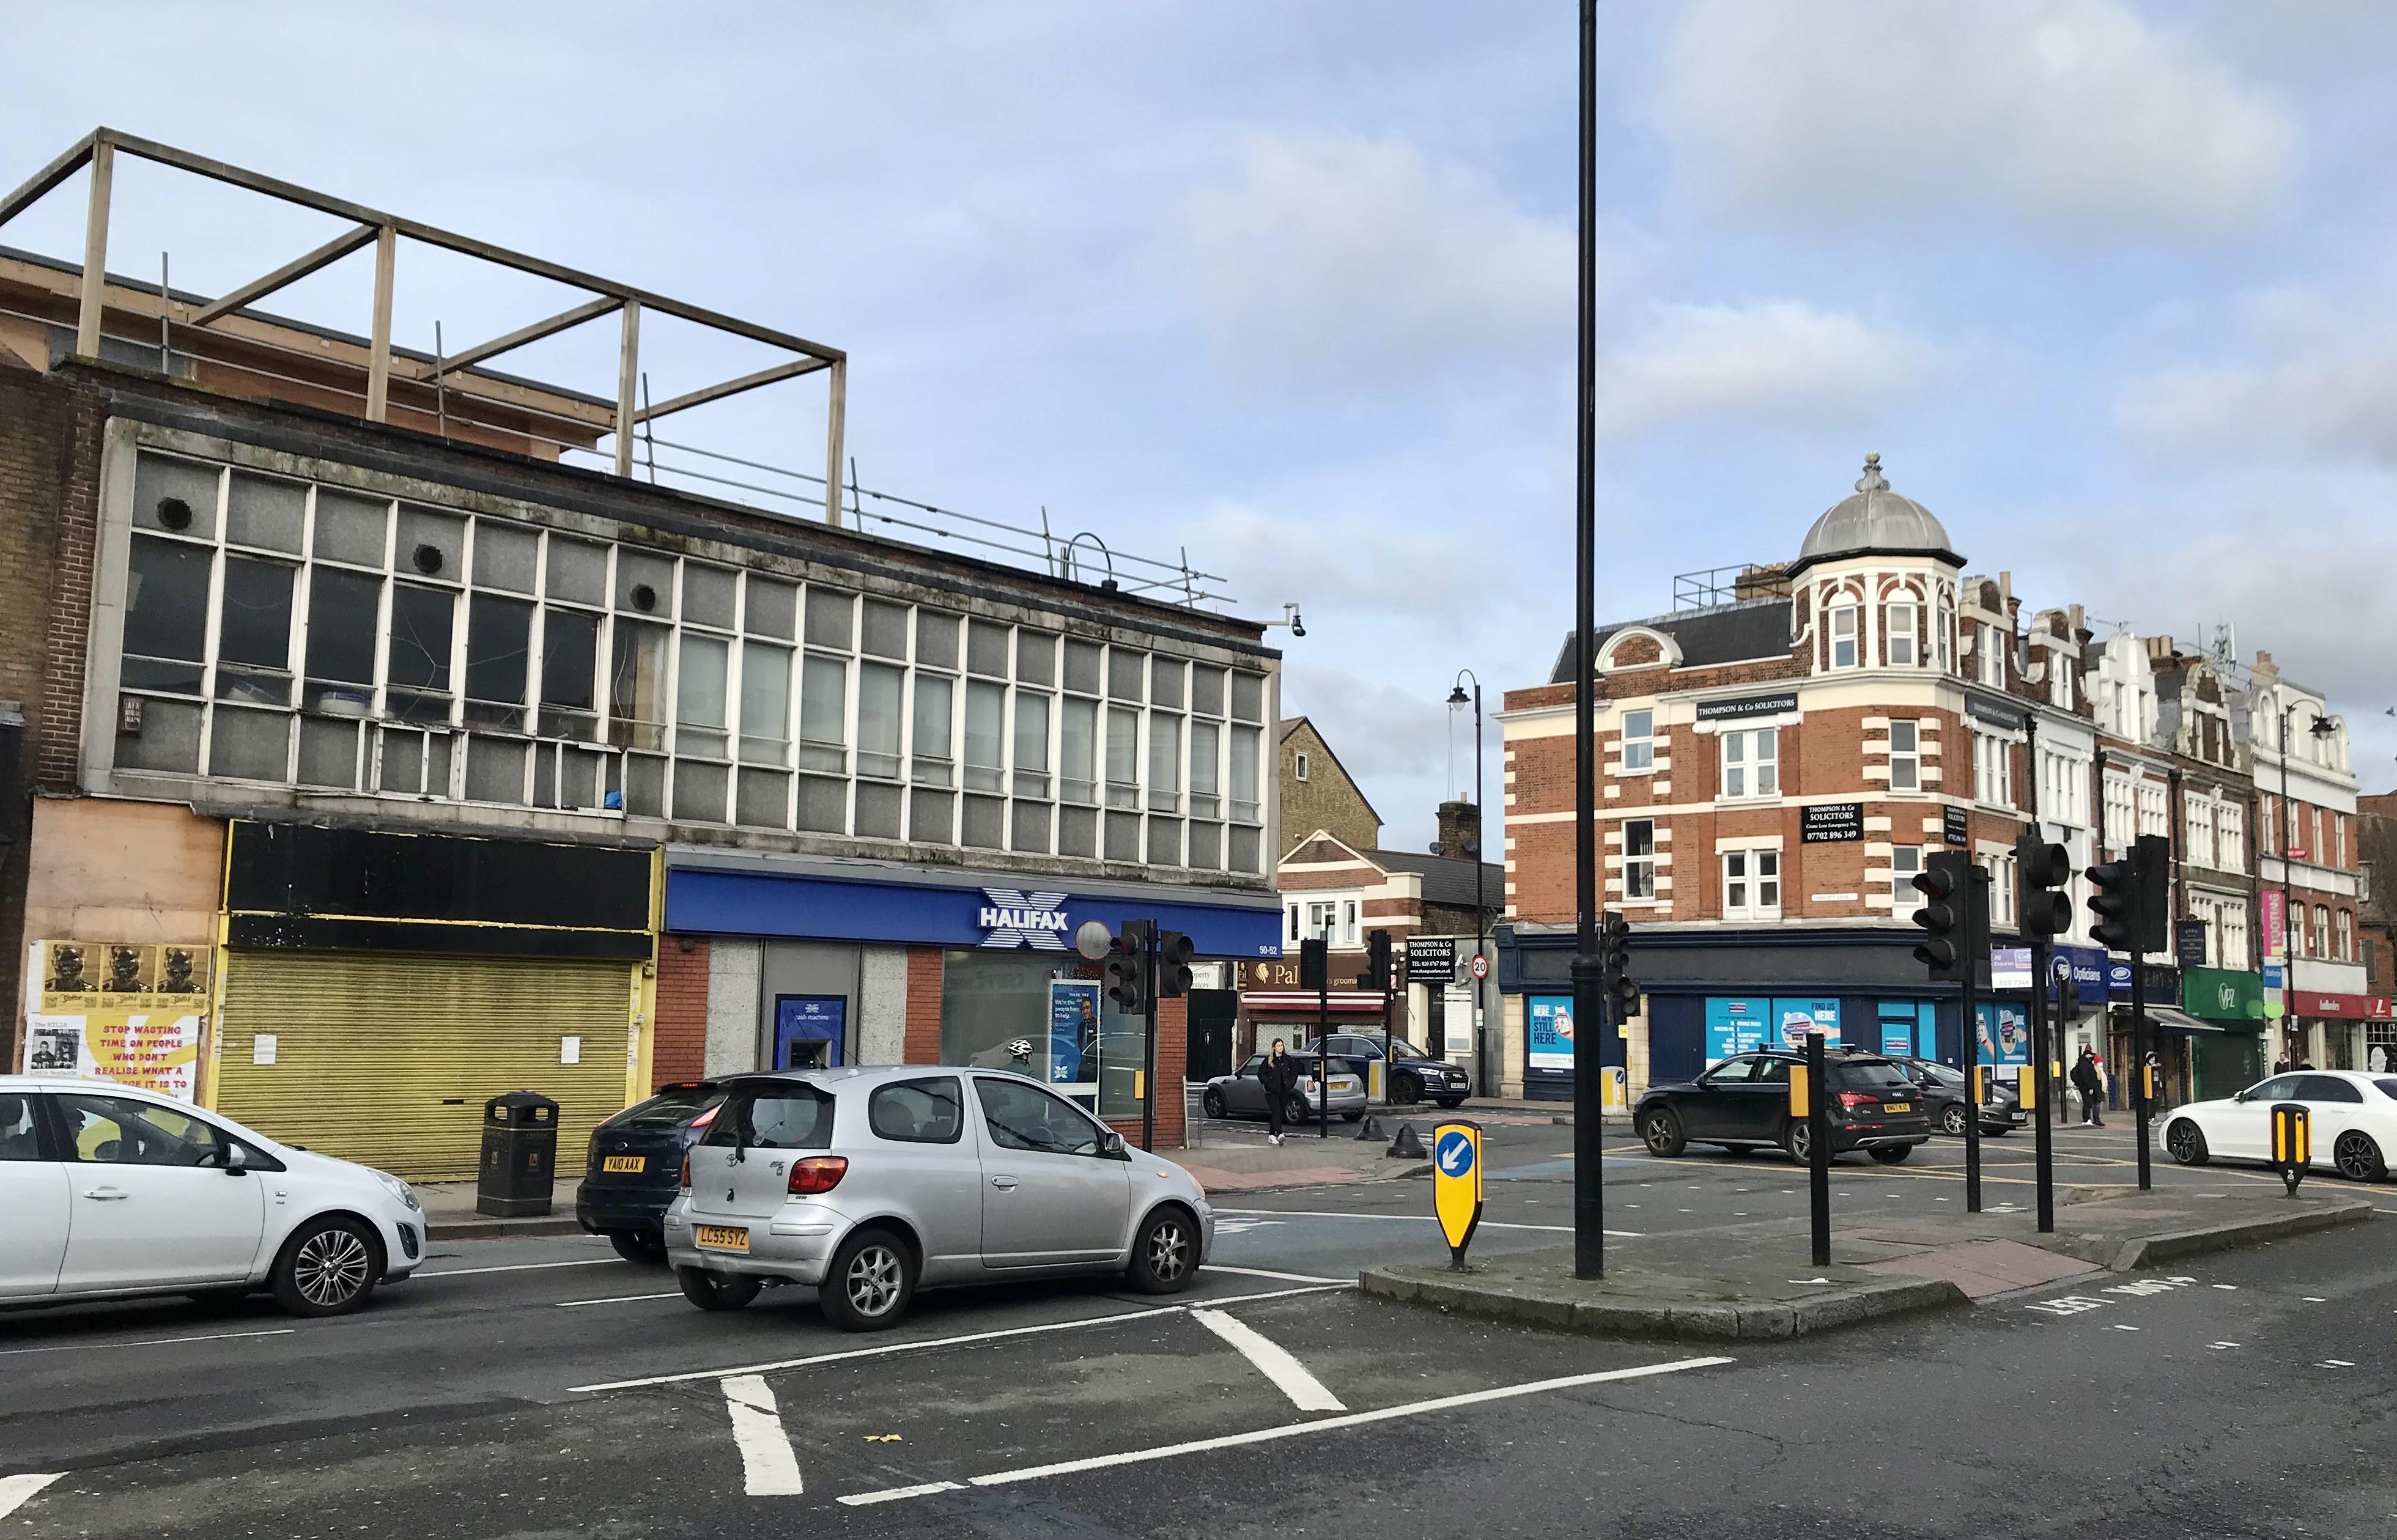 Wimpy(left)towards Tooting High Street